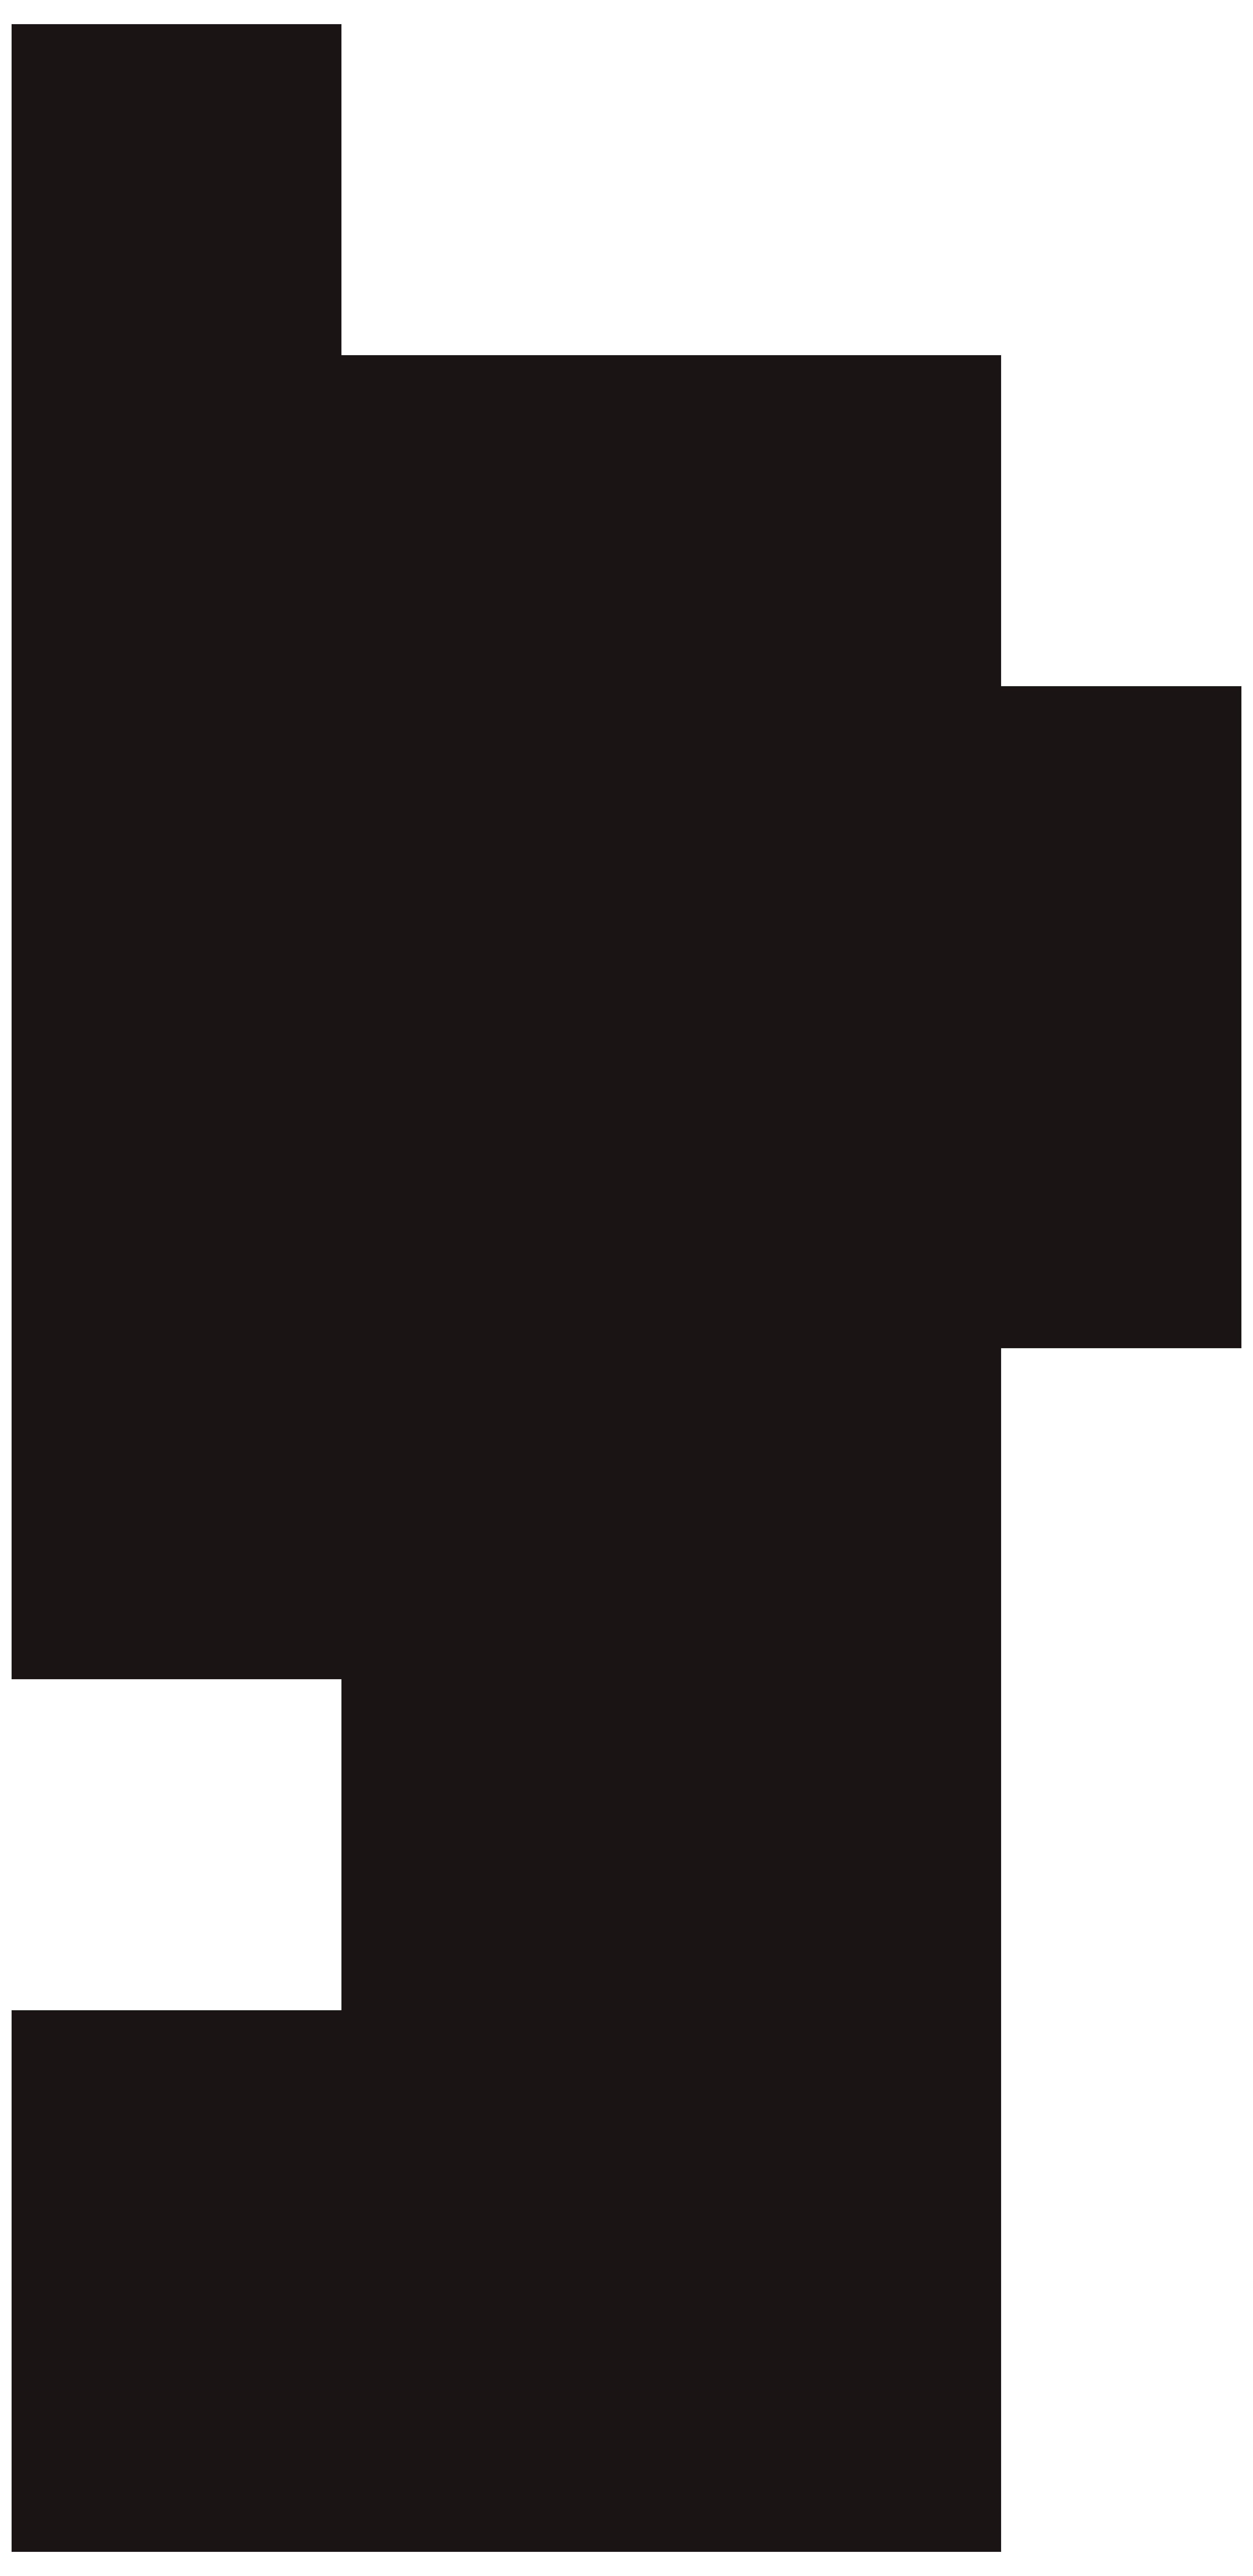 Ballerina Silhouette PNG Clip Art Image.